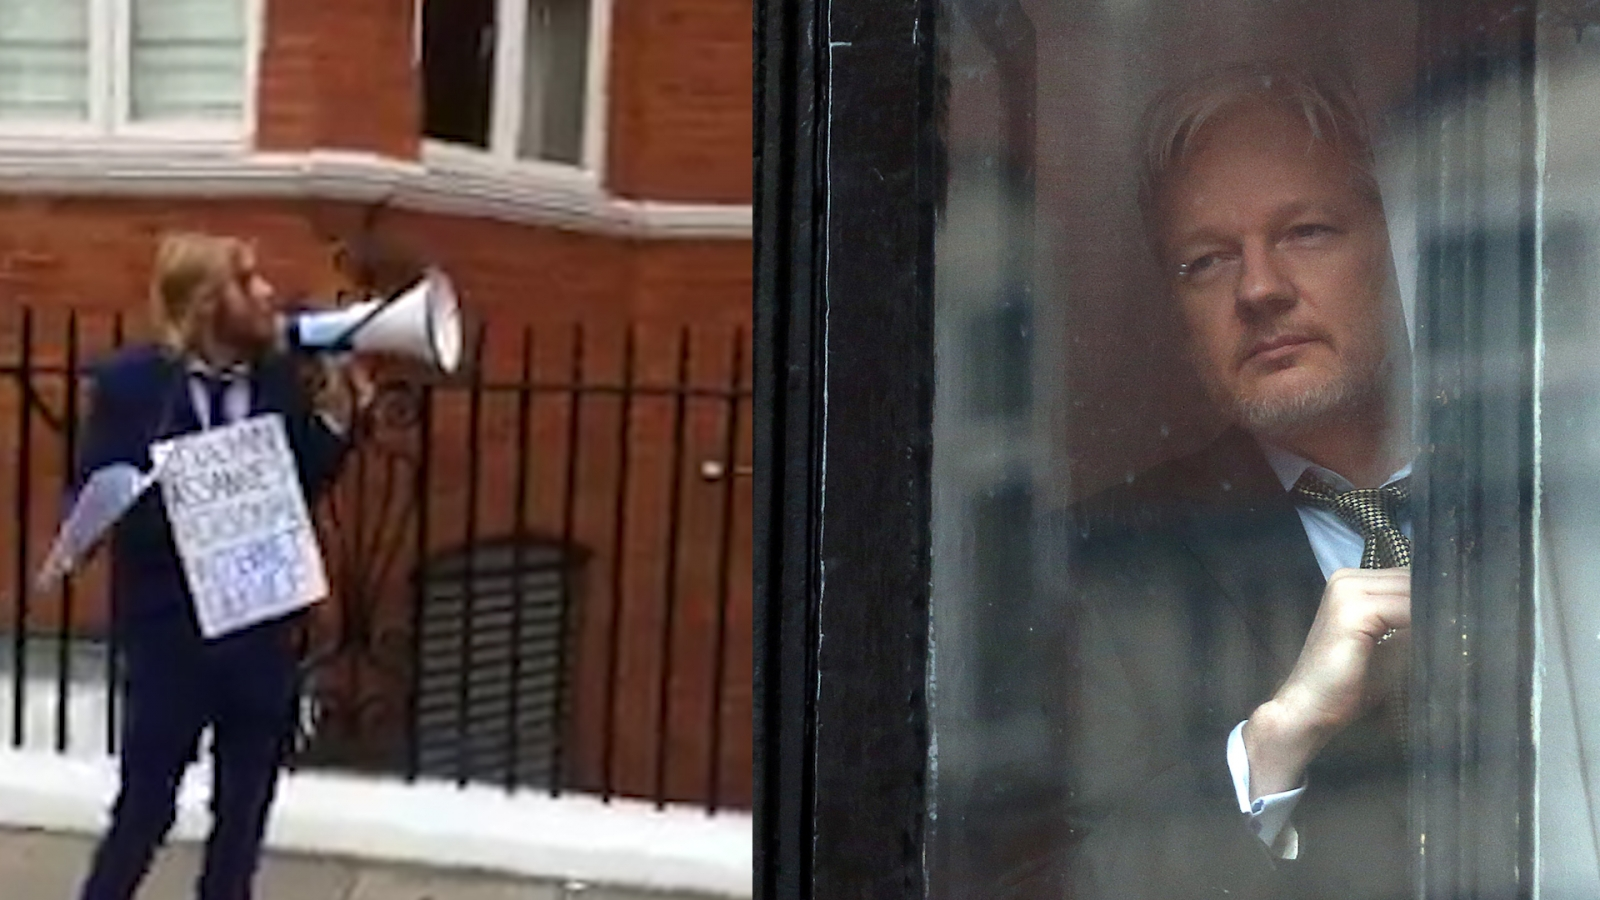 Julian Assange has the Internet read